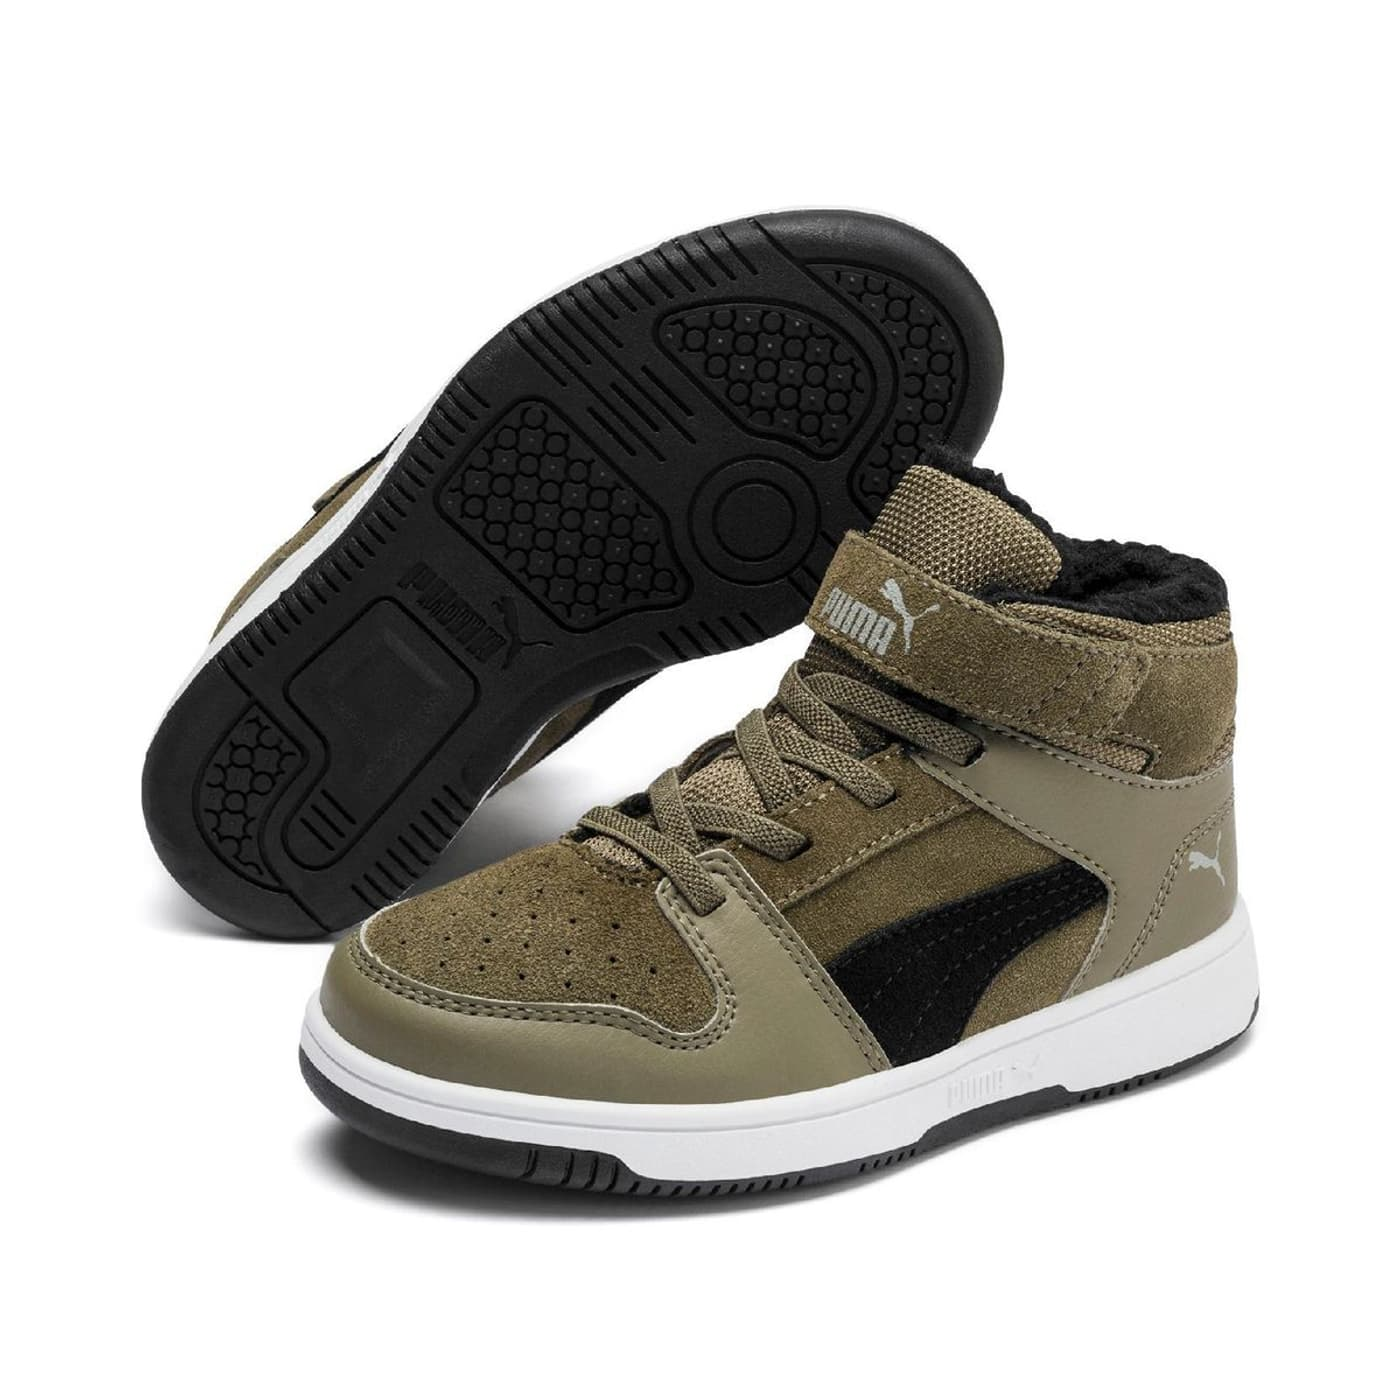 chaussure puma jl garcons